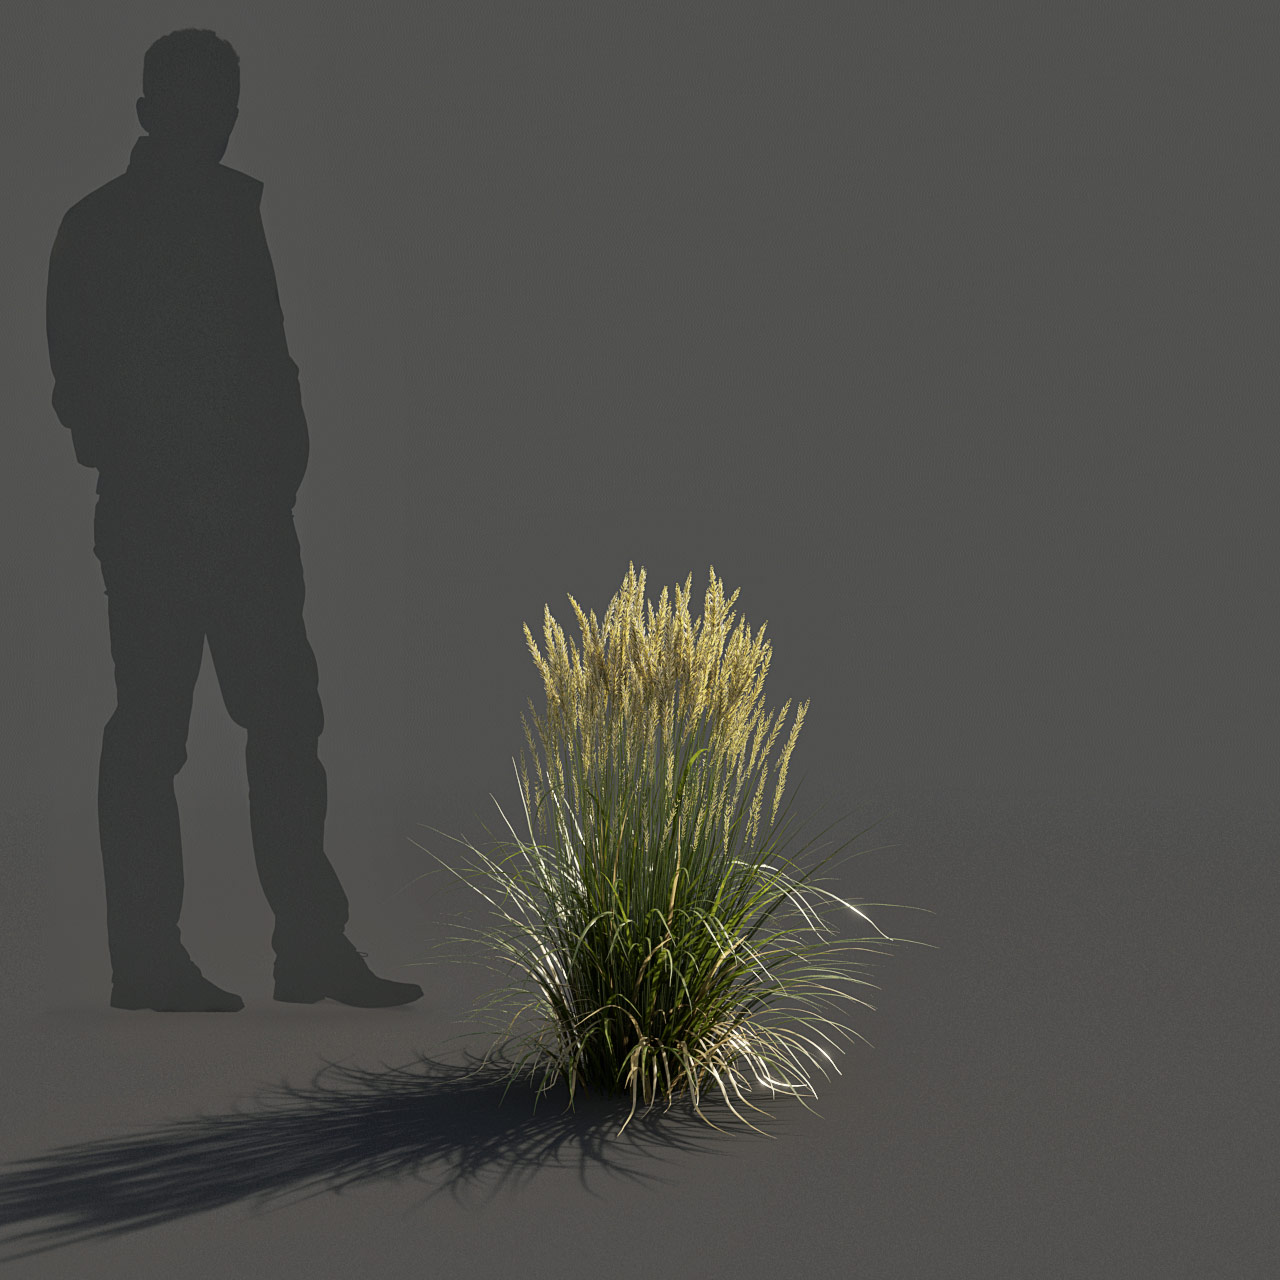 Feather Reed Grass 3D model low_v03 -  'Karl Foerster' - Calamagrostis acutiflora